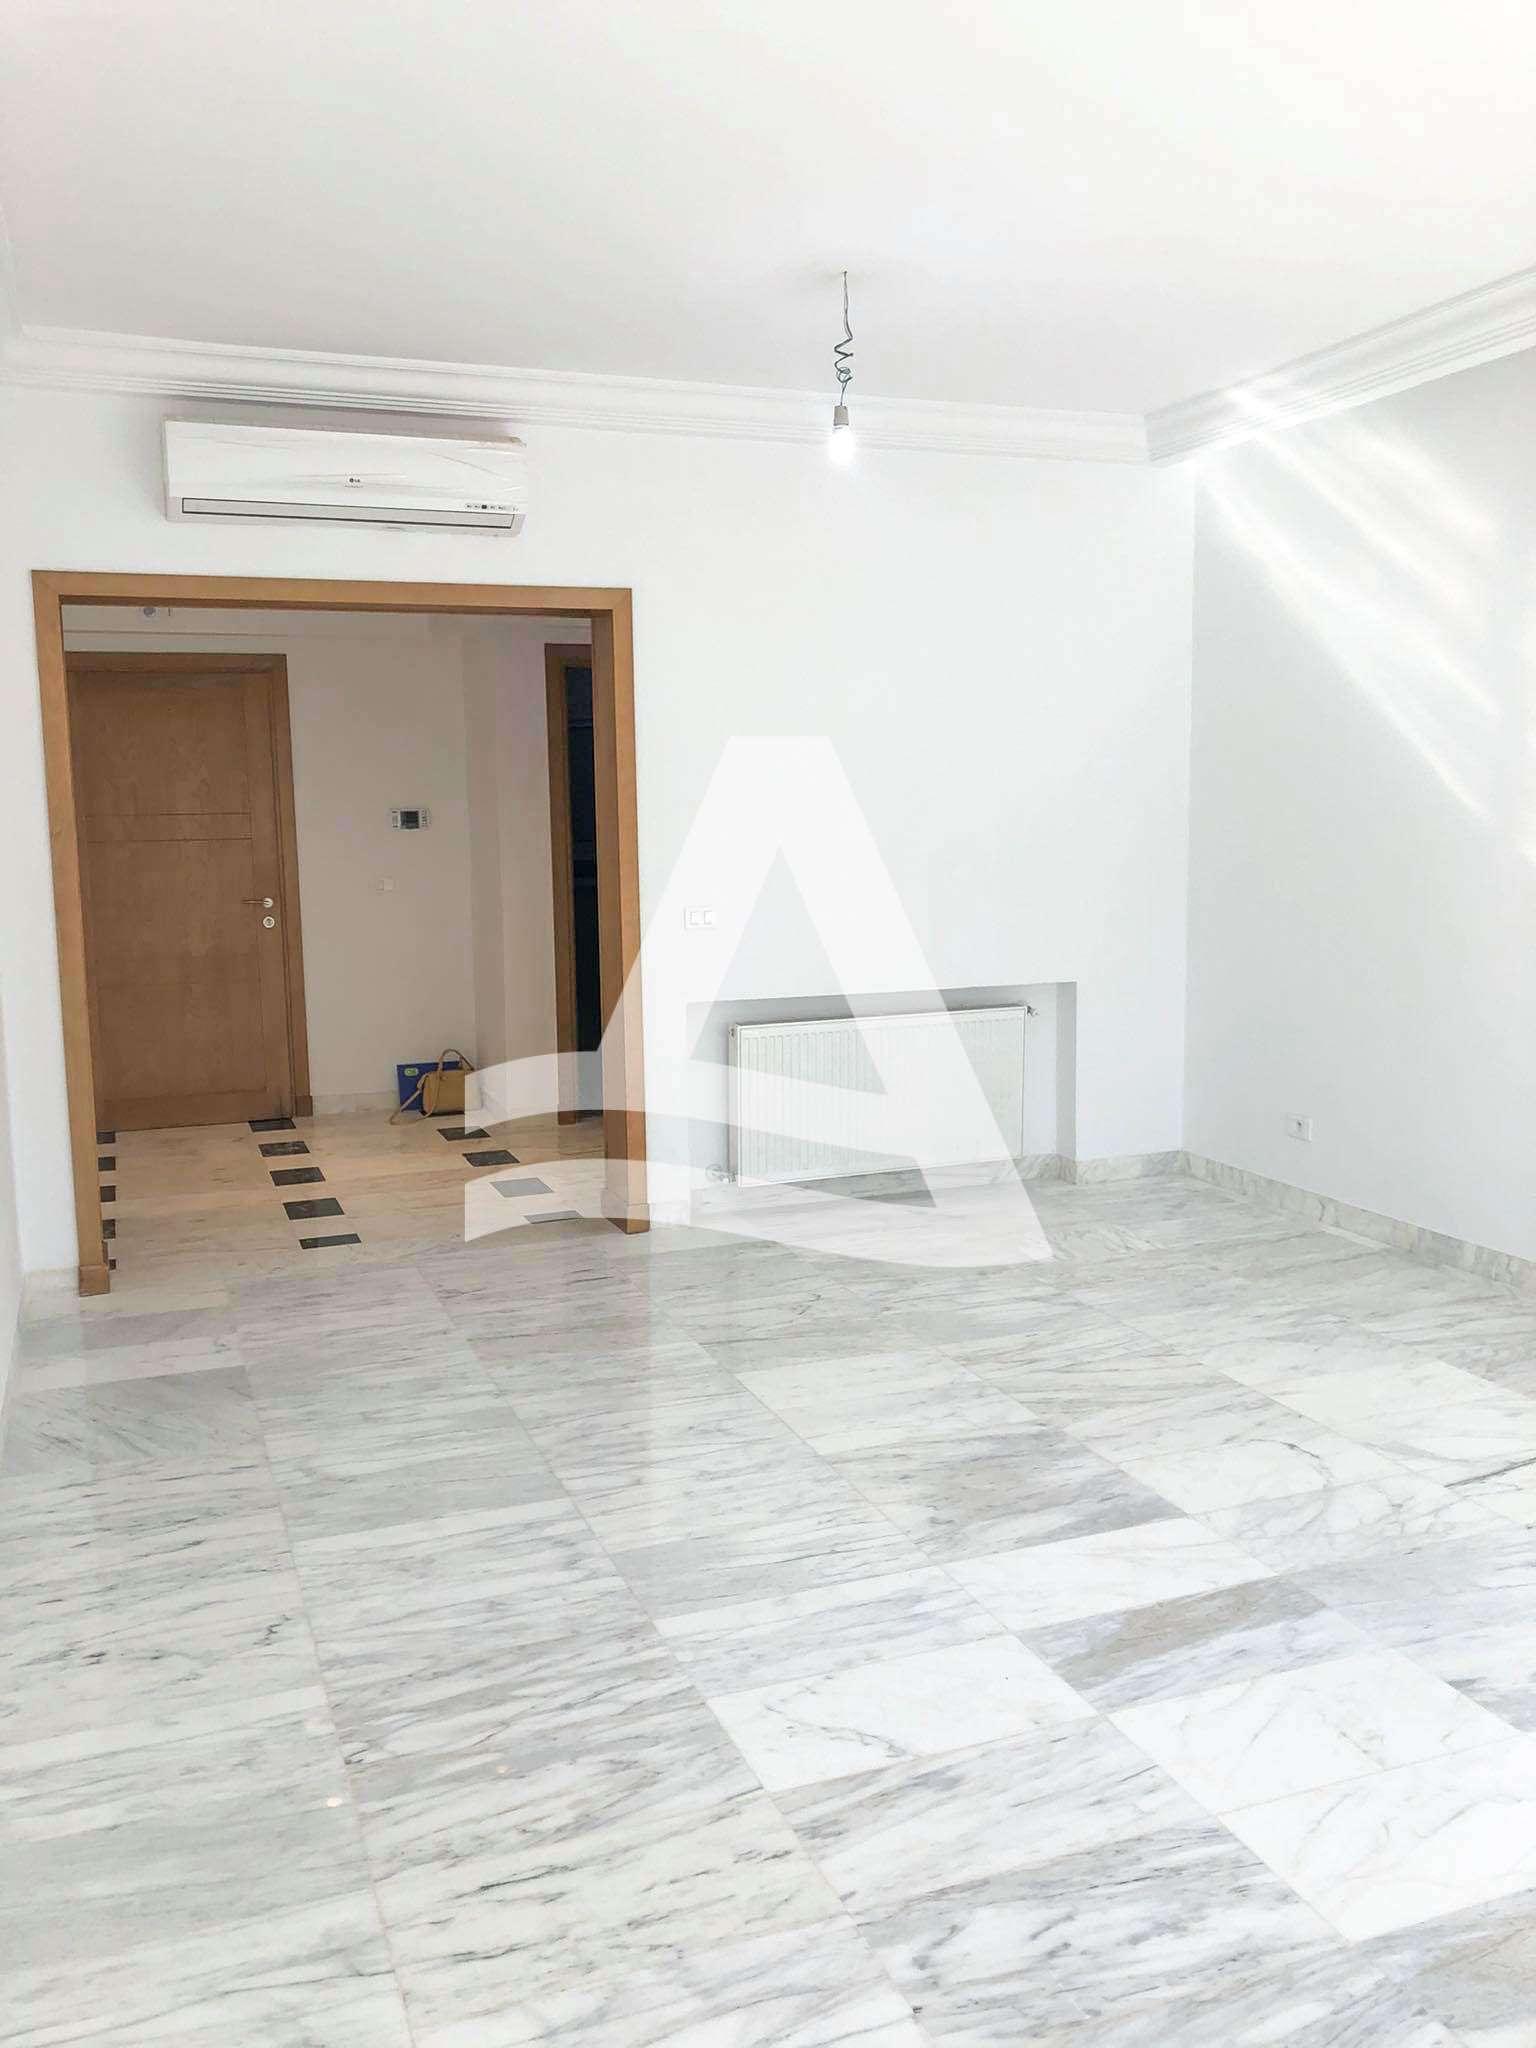 httpss3.amazonaws.comlogimoaws7792206401611135262appartement_jardin_de_carthage_9_sur_13-2